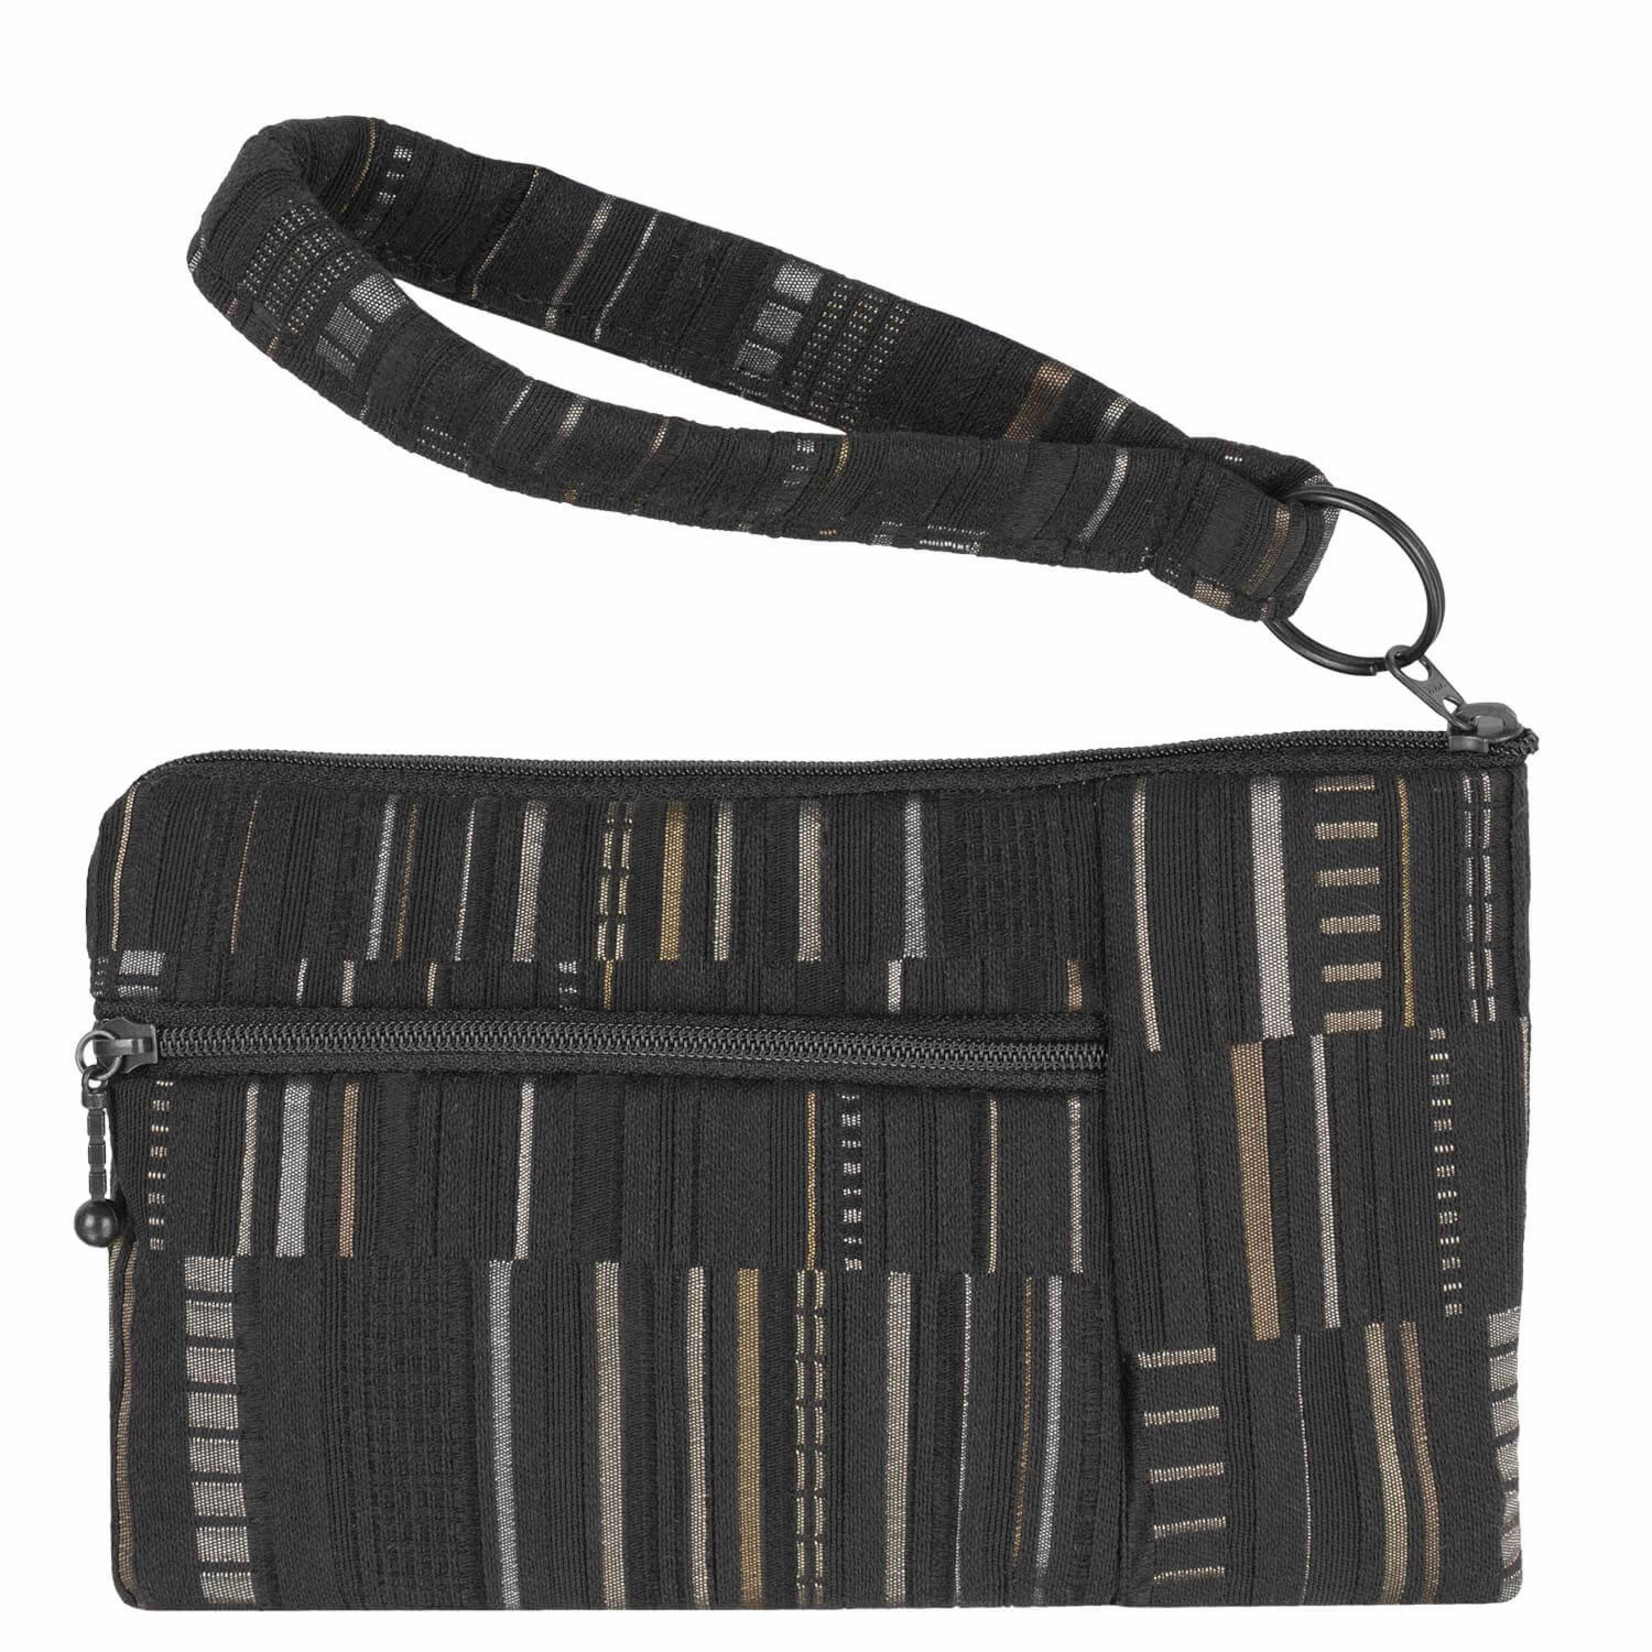 Maruca Beetle Wristlet FW21 - Bark Cloth Black